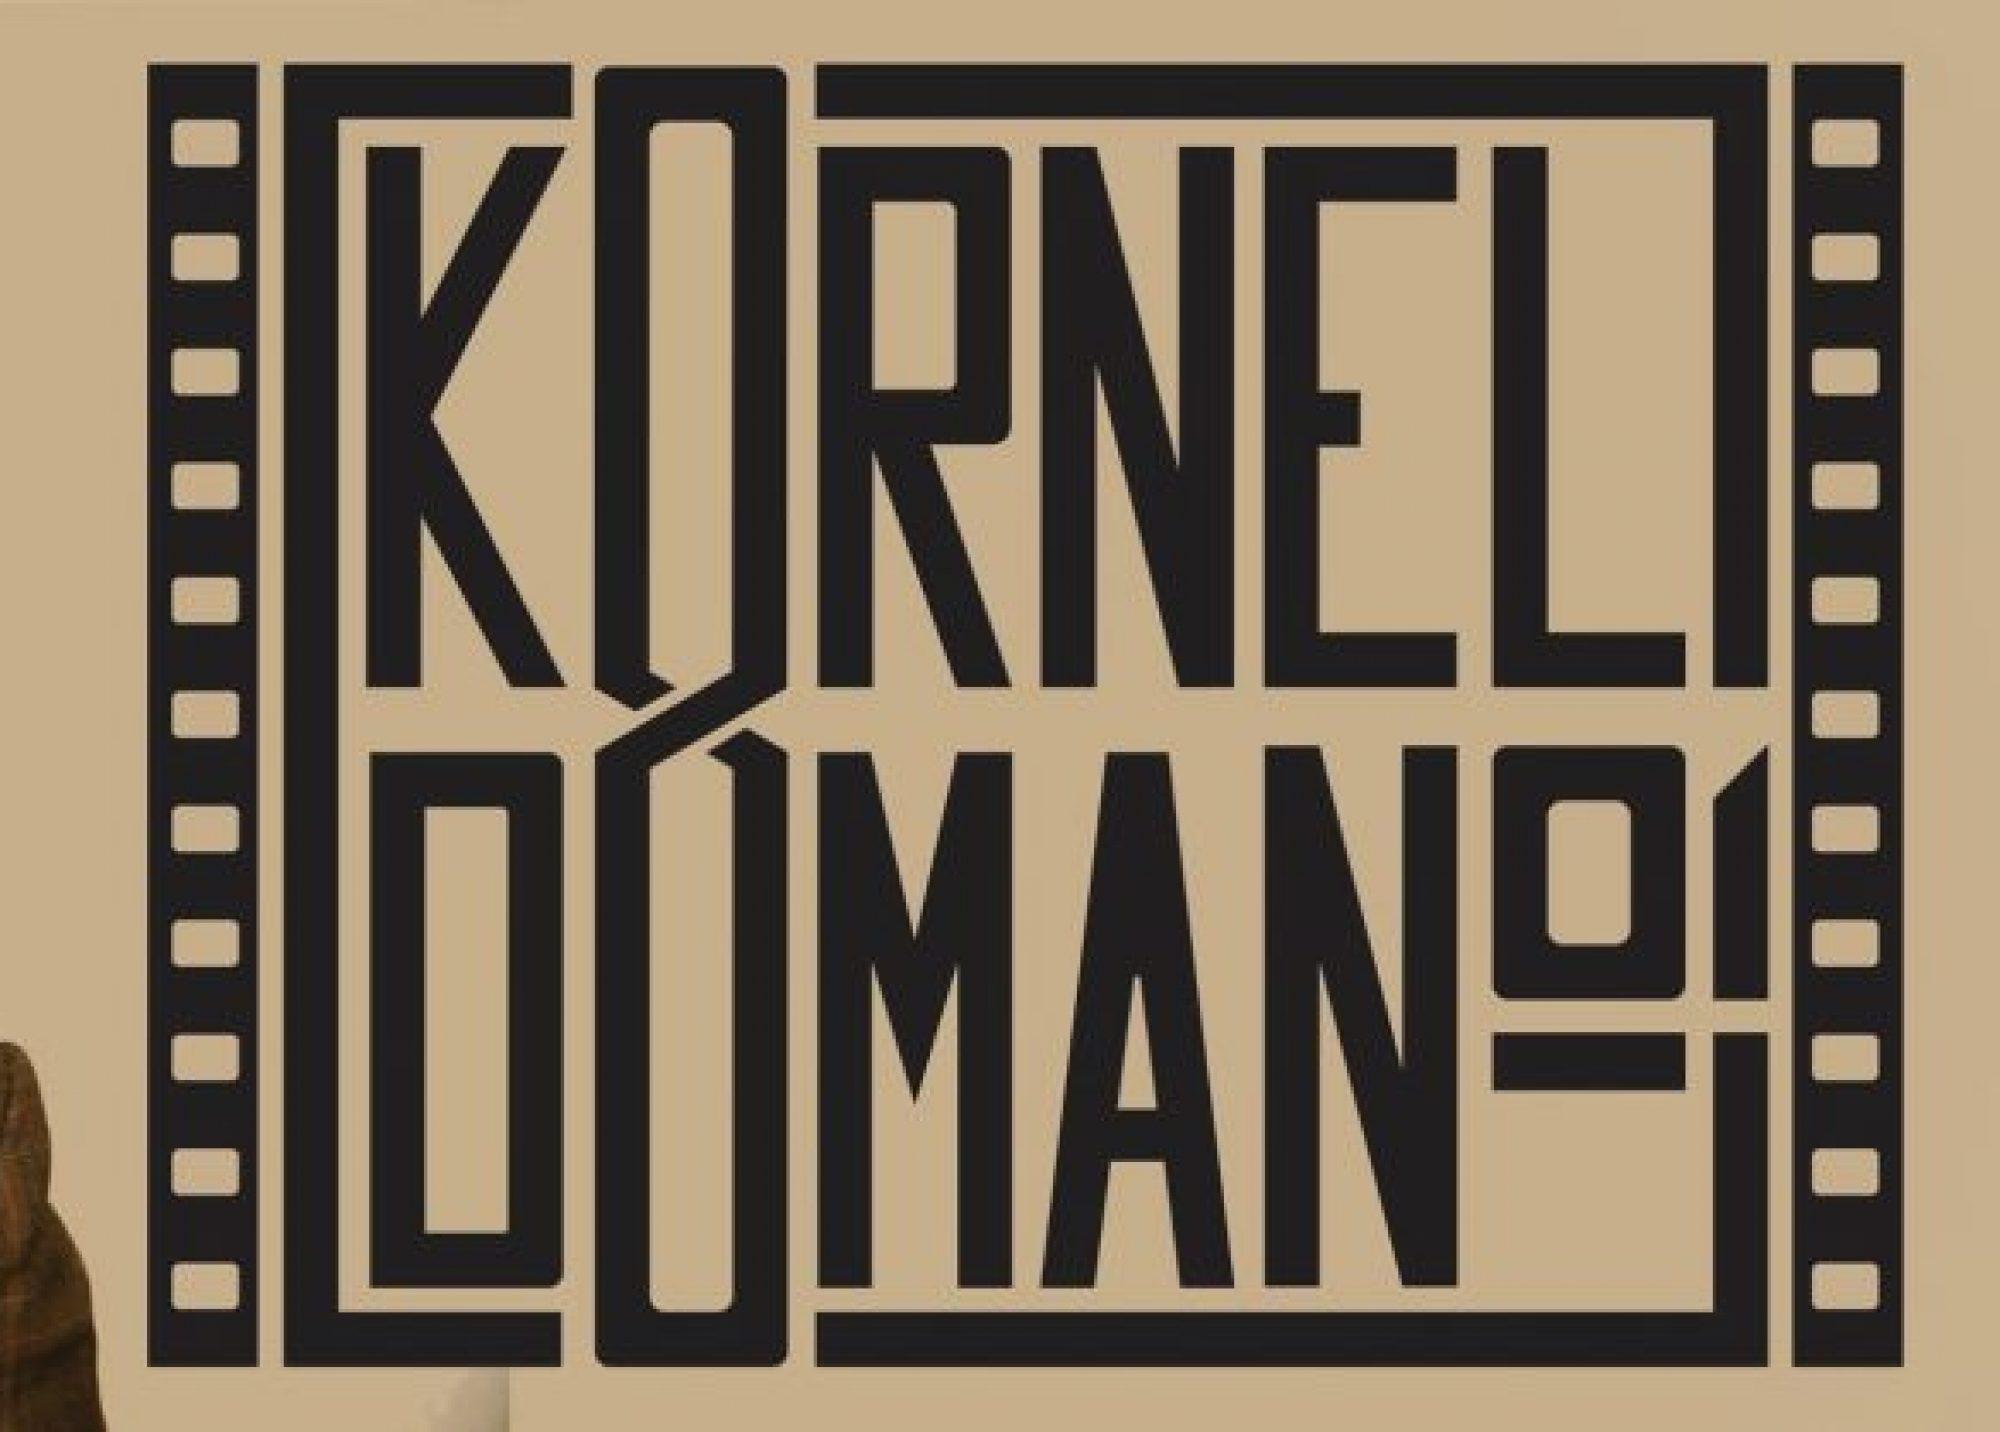 Kornel Doman